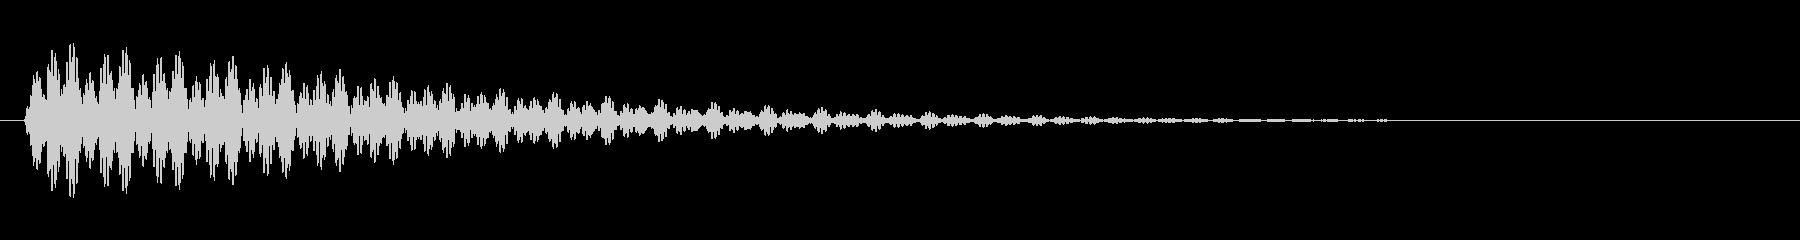 KANTクリック効果音20832の未再生の波形